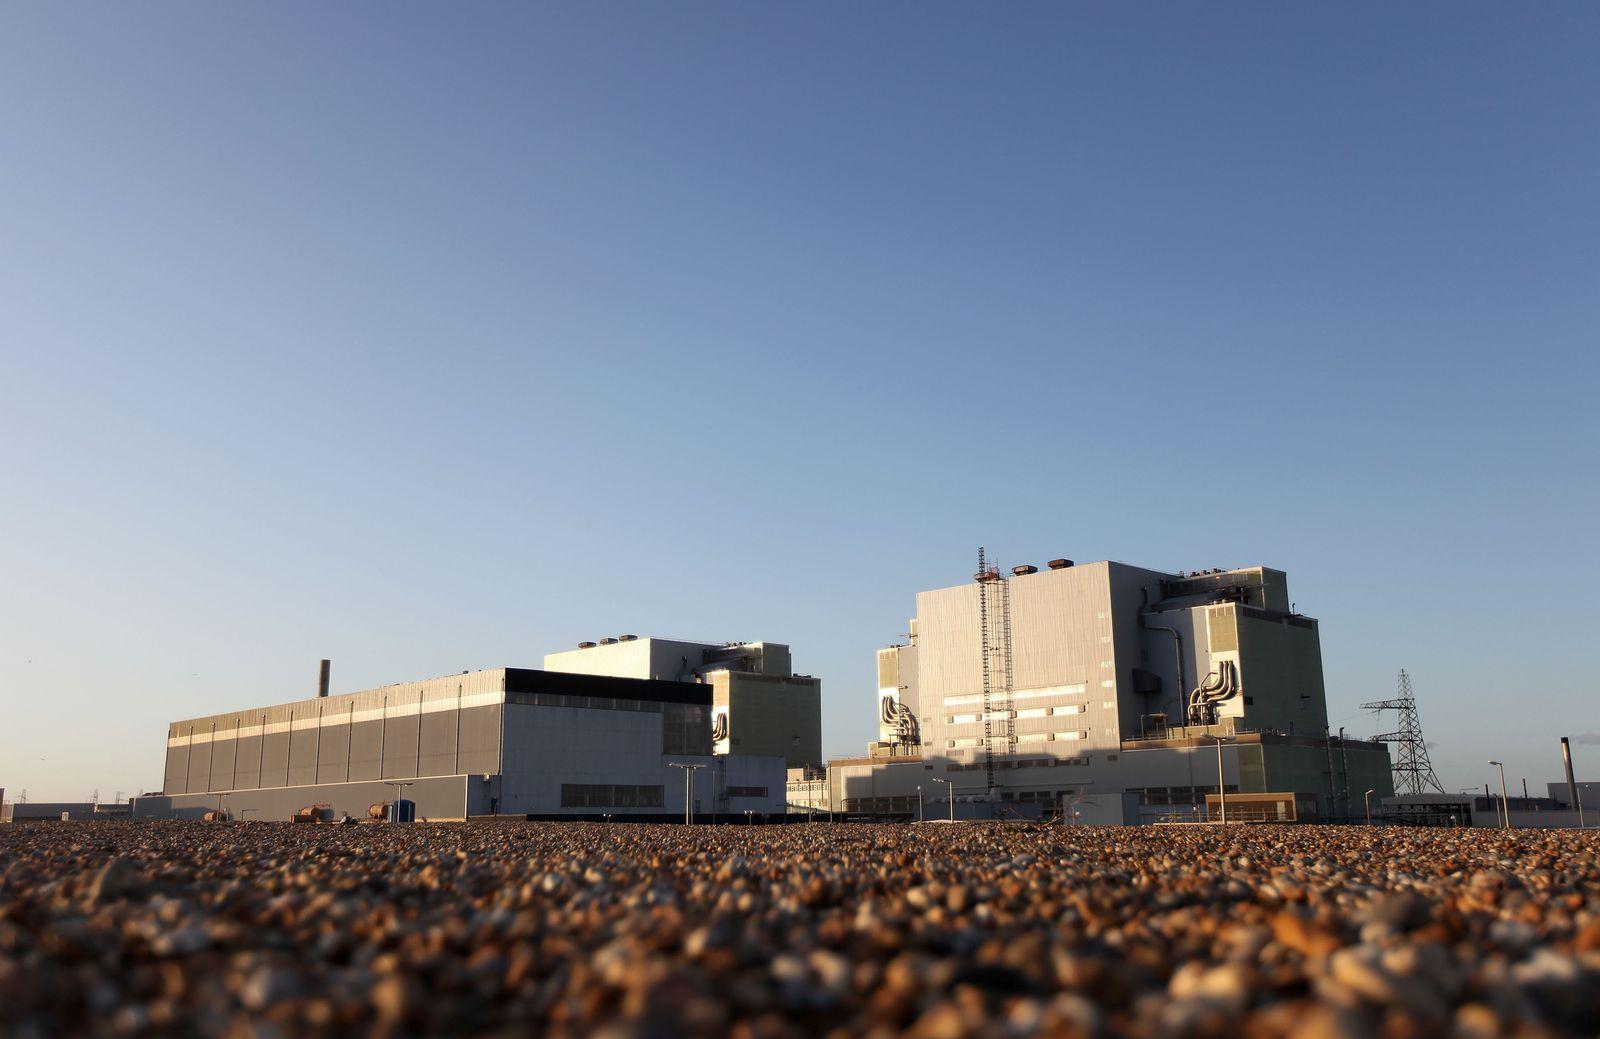 dungeness atomkraftwerk